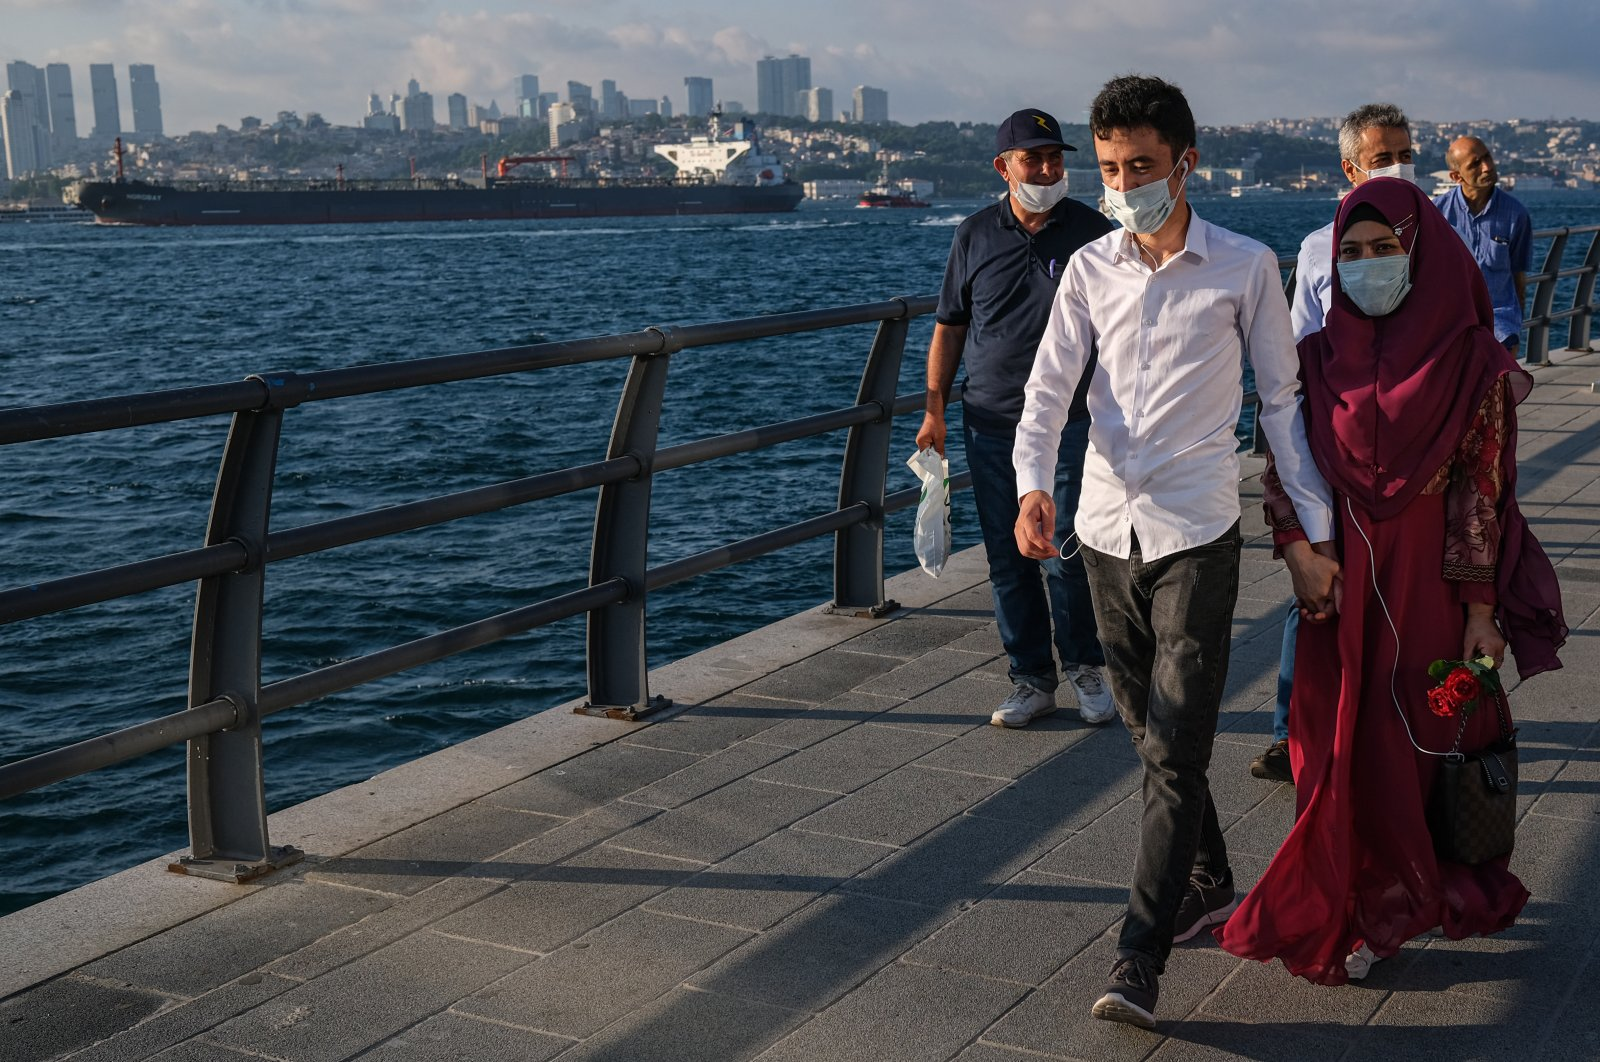 People walk near Bosporus, amid the ongoing coronavirus pandemic in Istanbul, July 5, 2020. (EPA Photo)